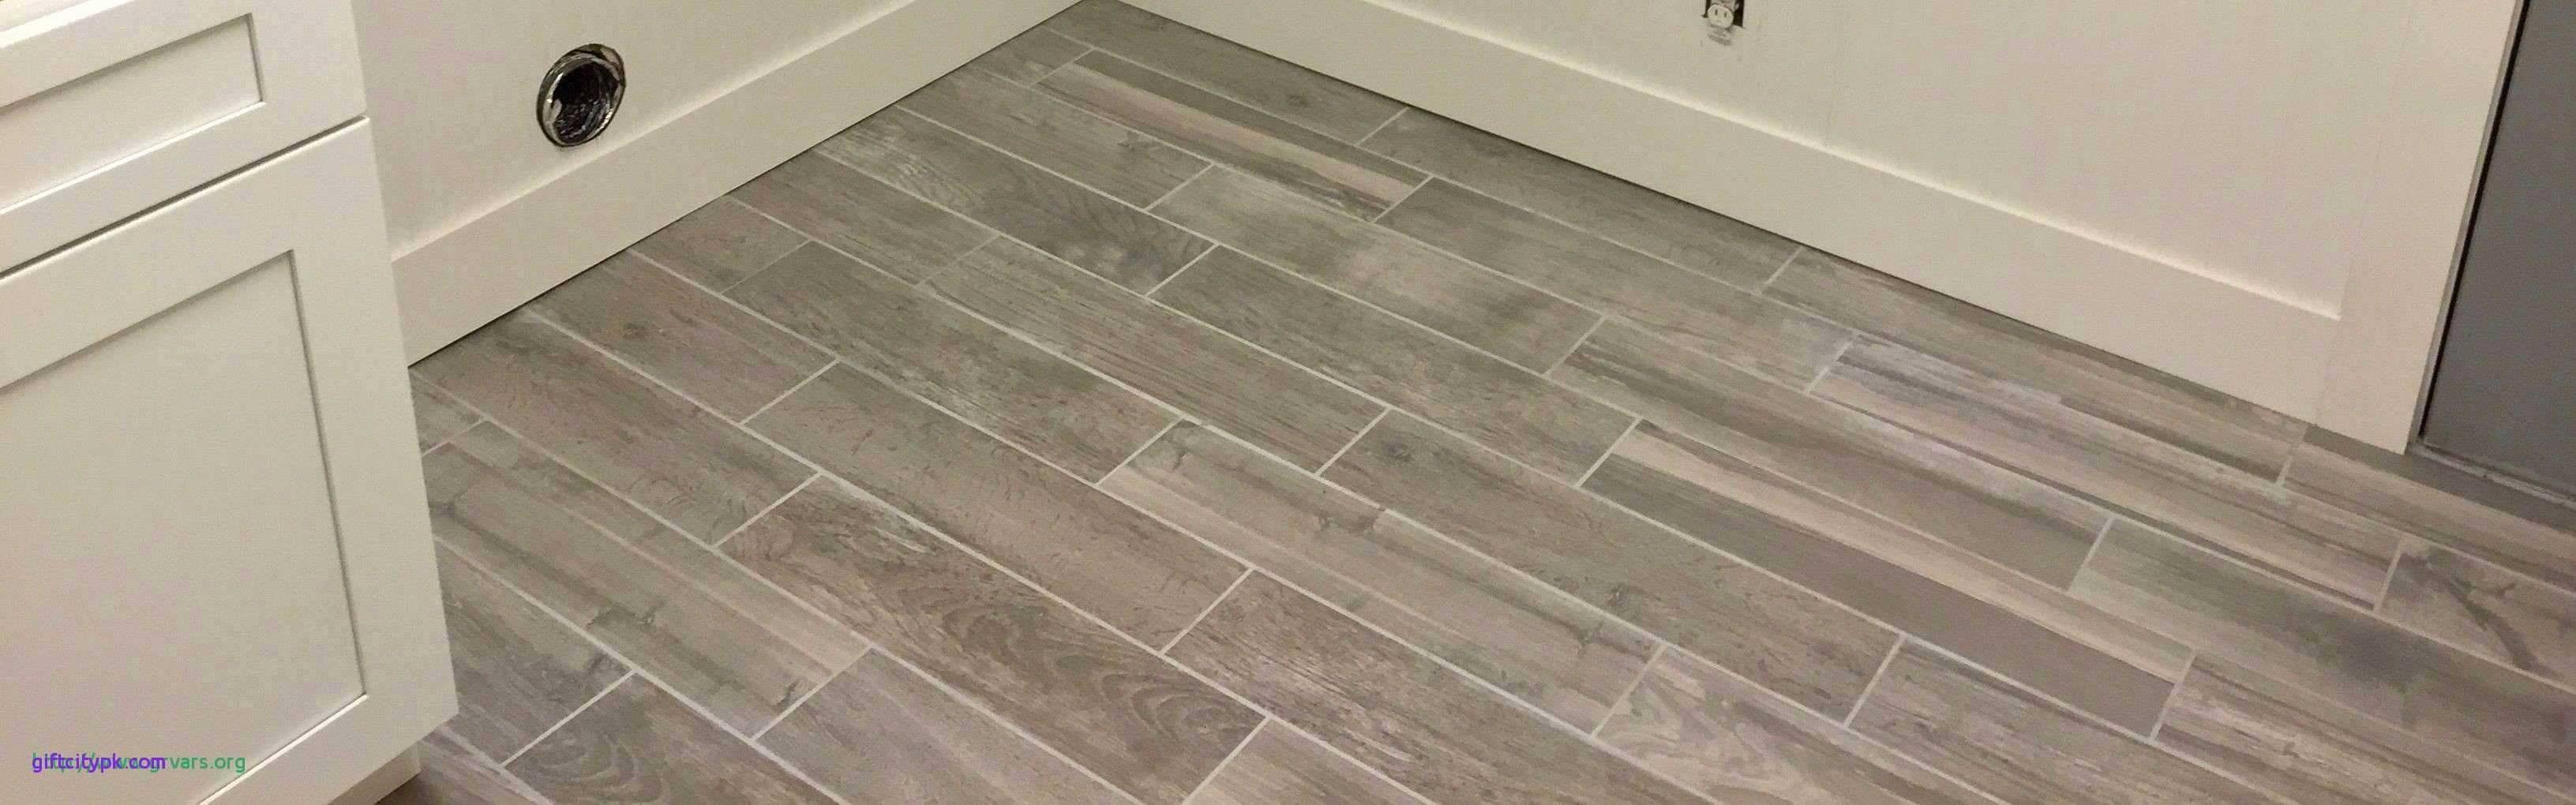 laminate hardwood flooring of chemical free flooring tcitypk tcitypk inside elegant unique bathroom tiling ideas best h sink install bathroom i 0d luxury shower tile